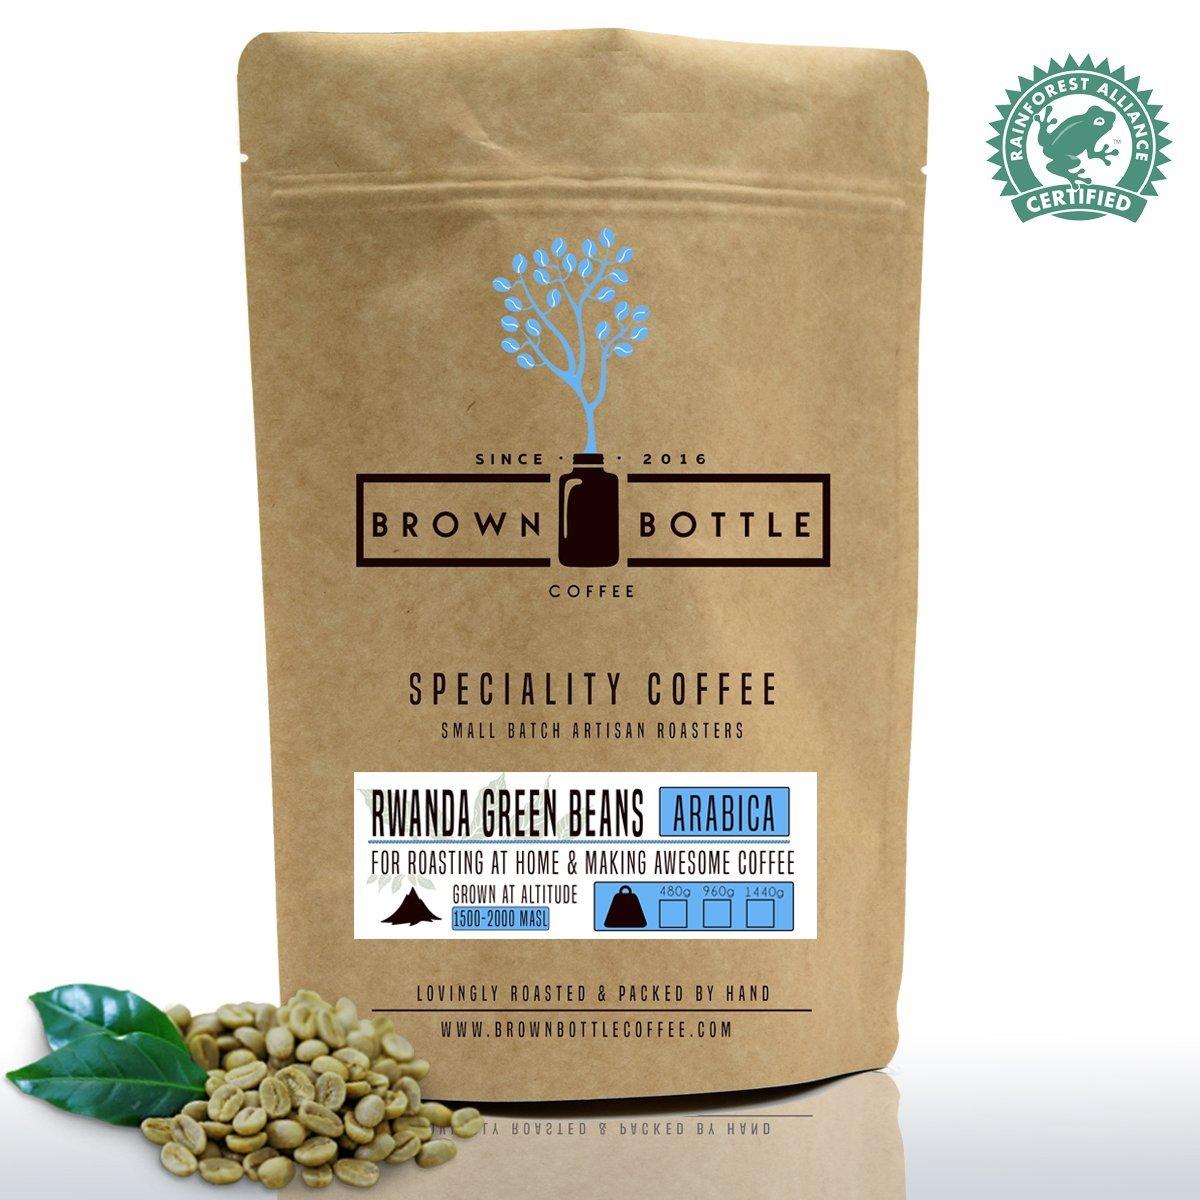 Speciality-Rwanda-Green-Coffee-Beans-100-Arabica-Speciality-Rwandan-Green-Coffee-Beans-For-Home-Roasting